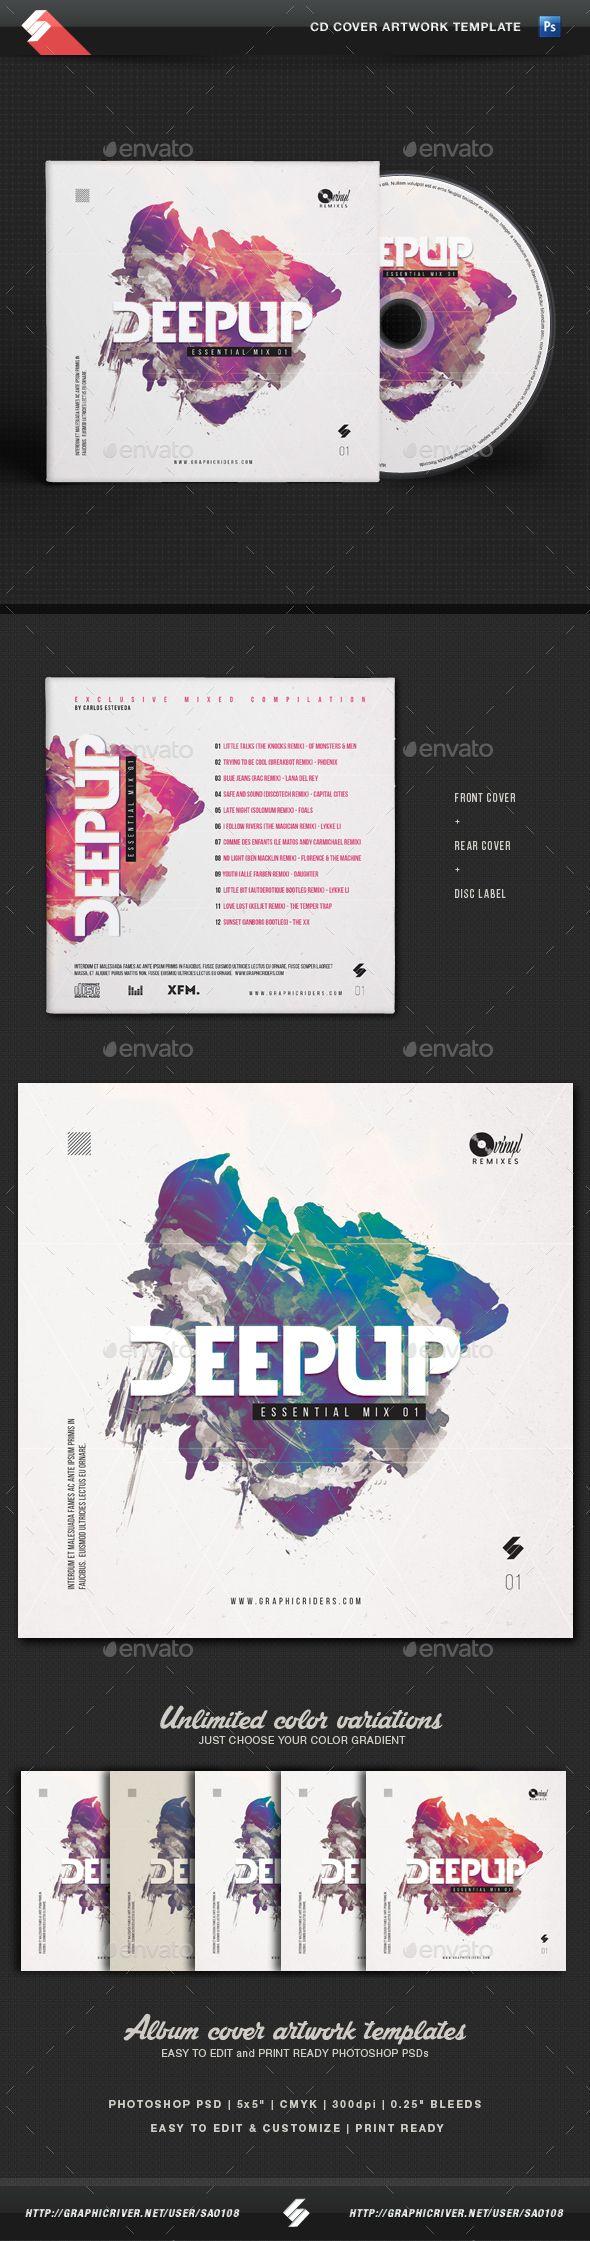 Deep Up - Dj Mix CD Cover Artwork Template